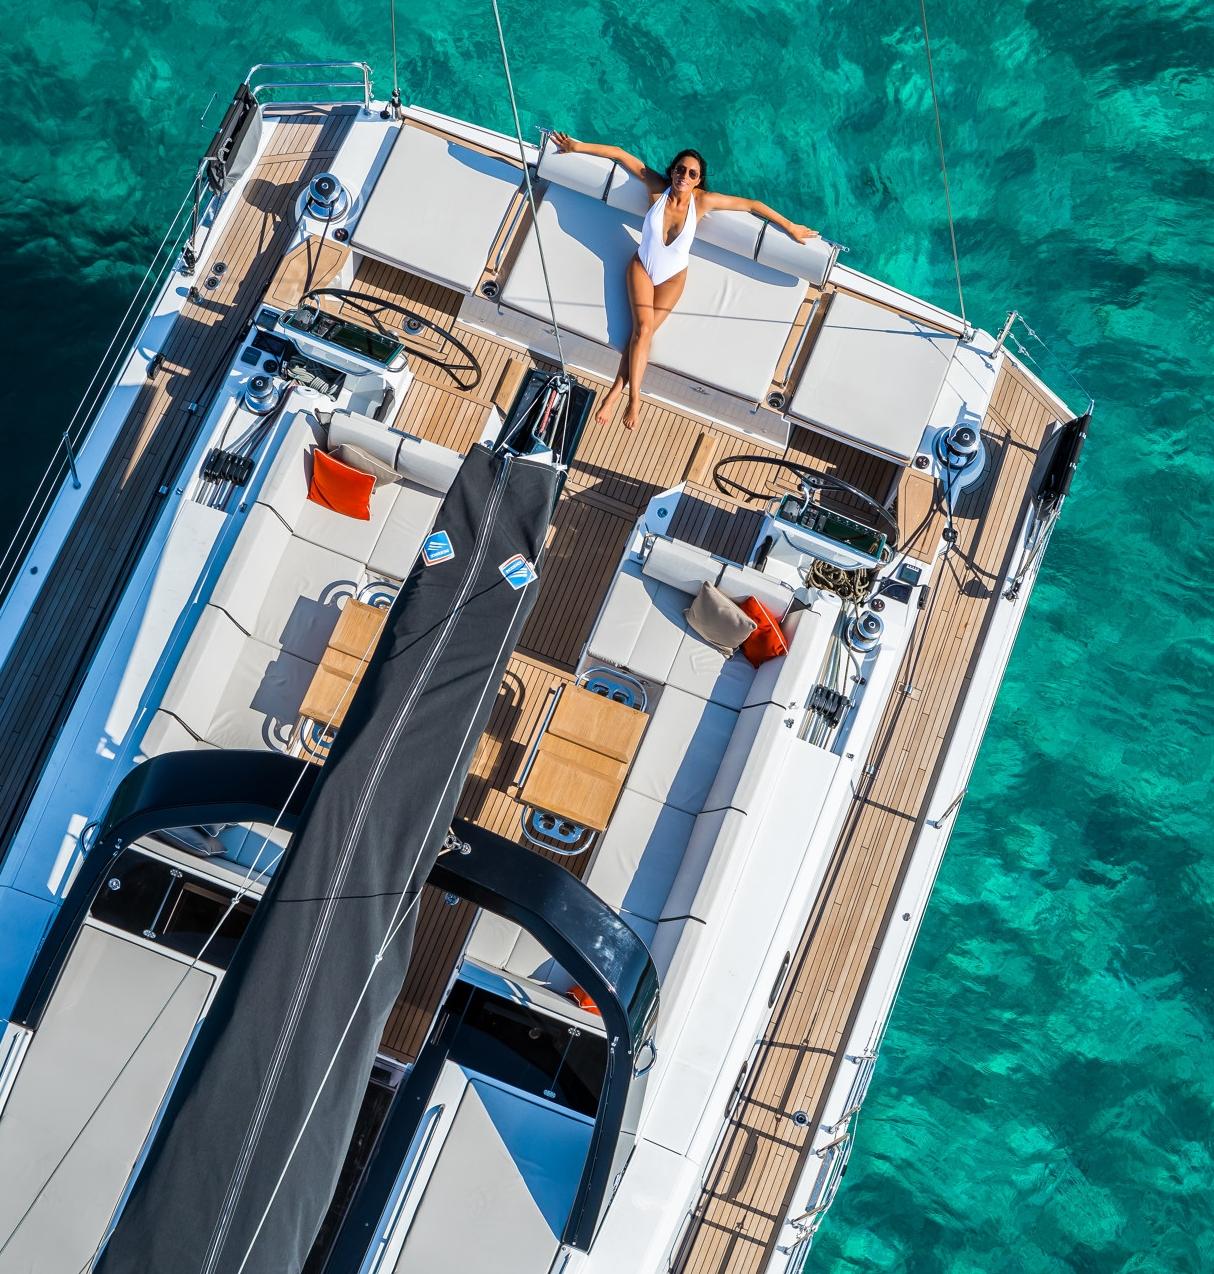 Beneteau Oceanis 62 Yacht